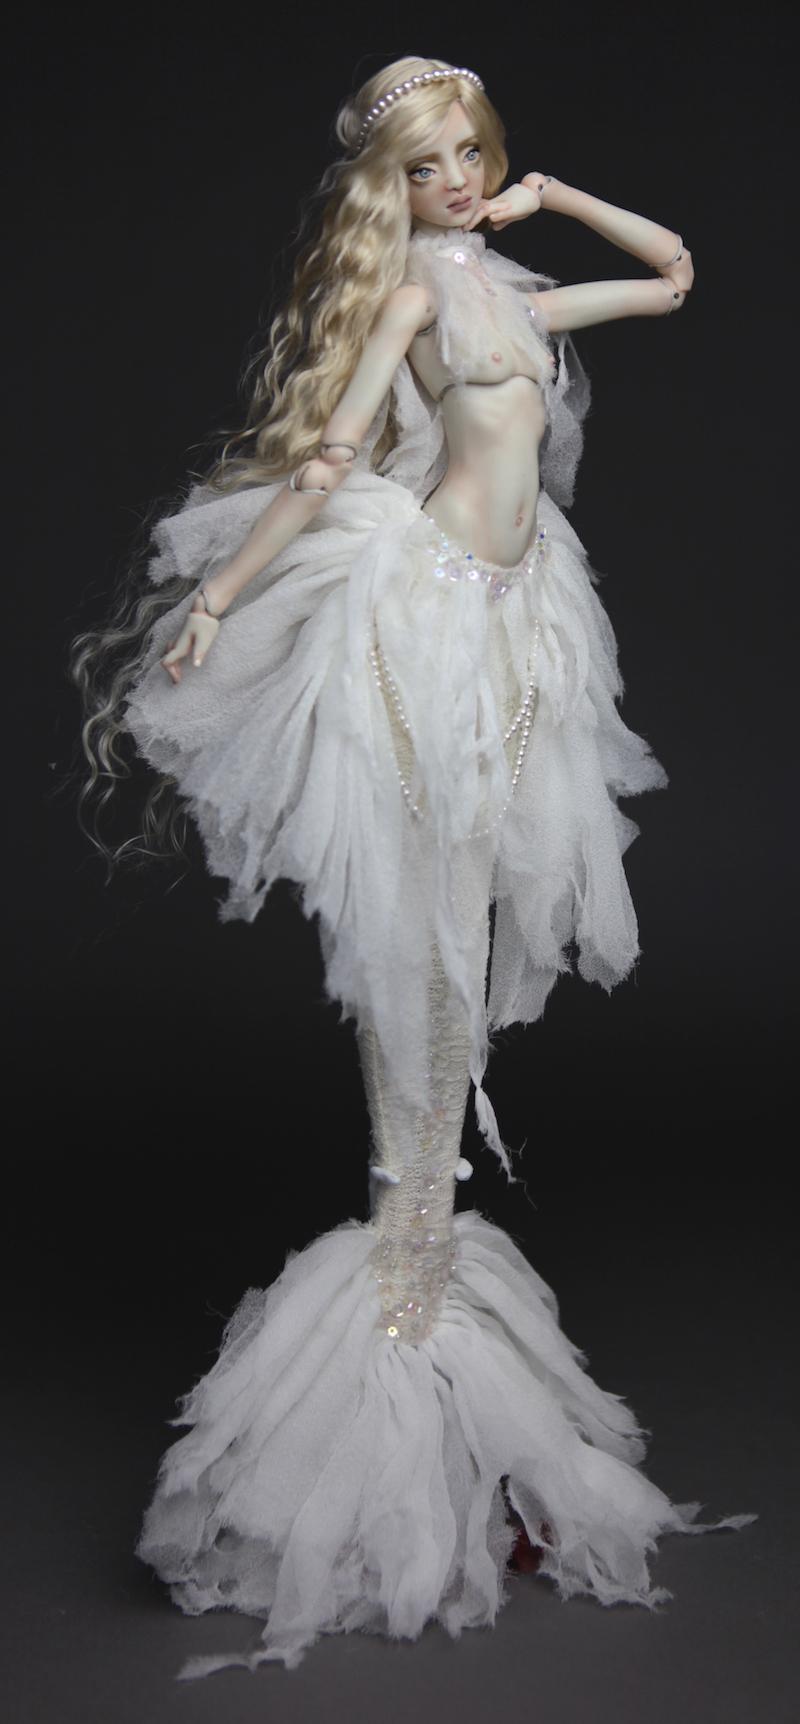 BJD Doll Ball Jointed Tattoed Baroque Sphinx 4 15 Porcelain BJD Doll   White Betta Mermaid Luna